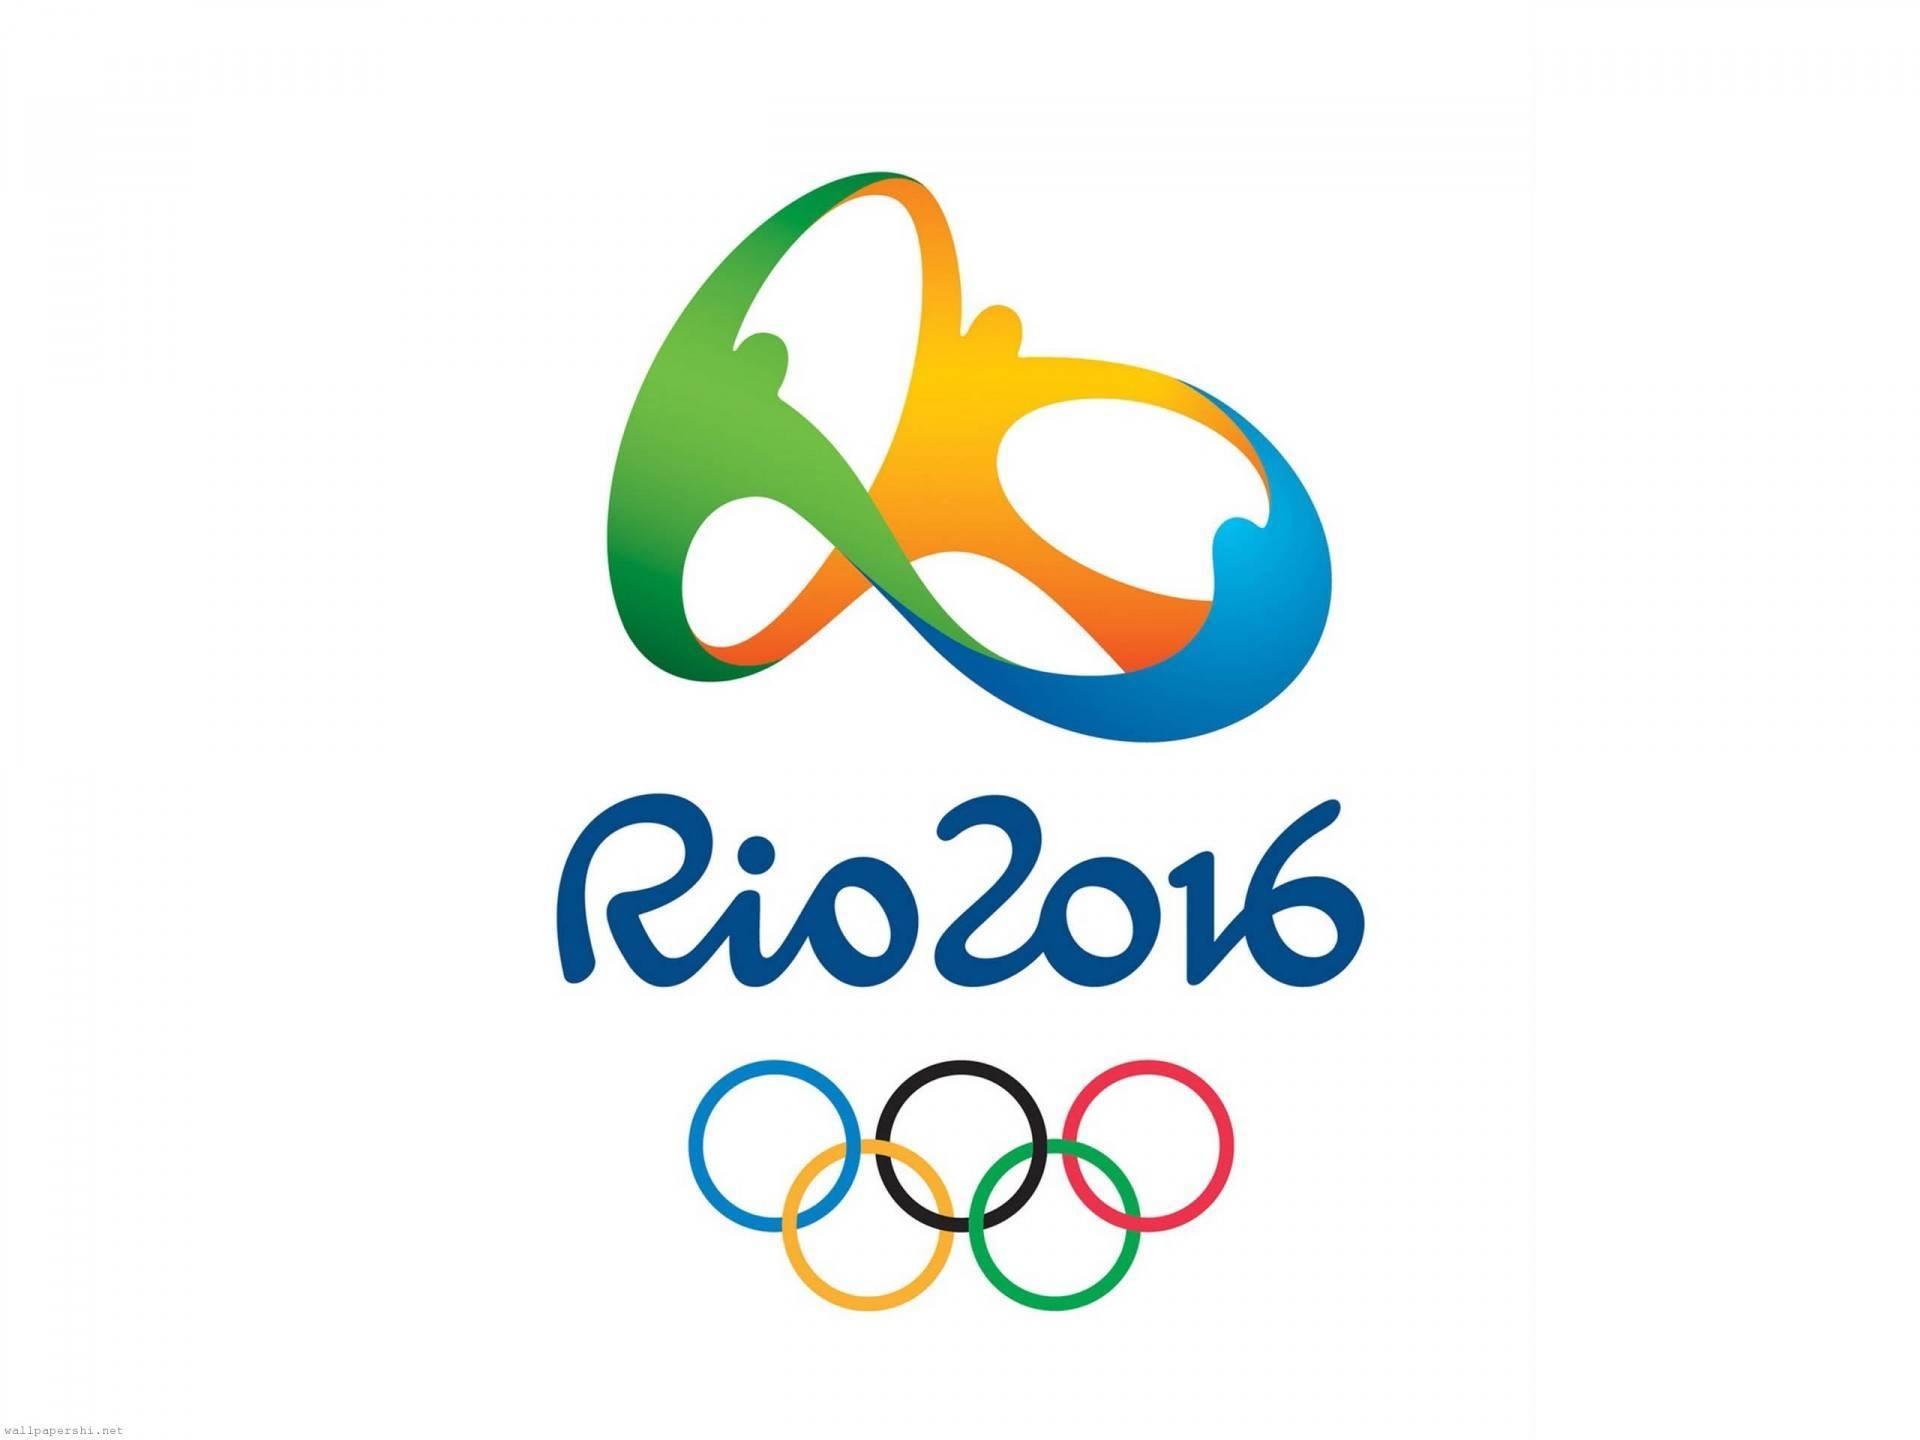 Олимпиада 2016. Спортивная гимнастика. Мужчины. Квалификация (07.08.2016)